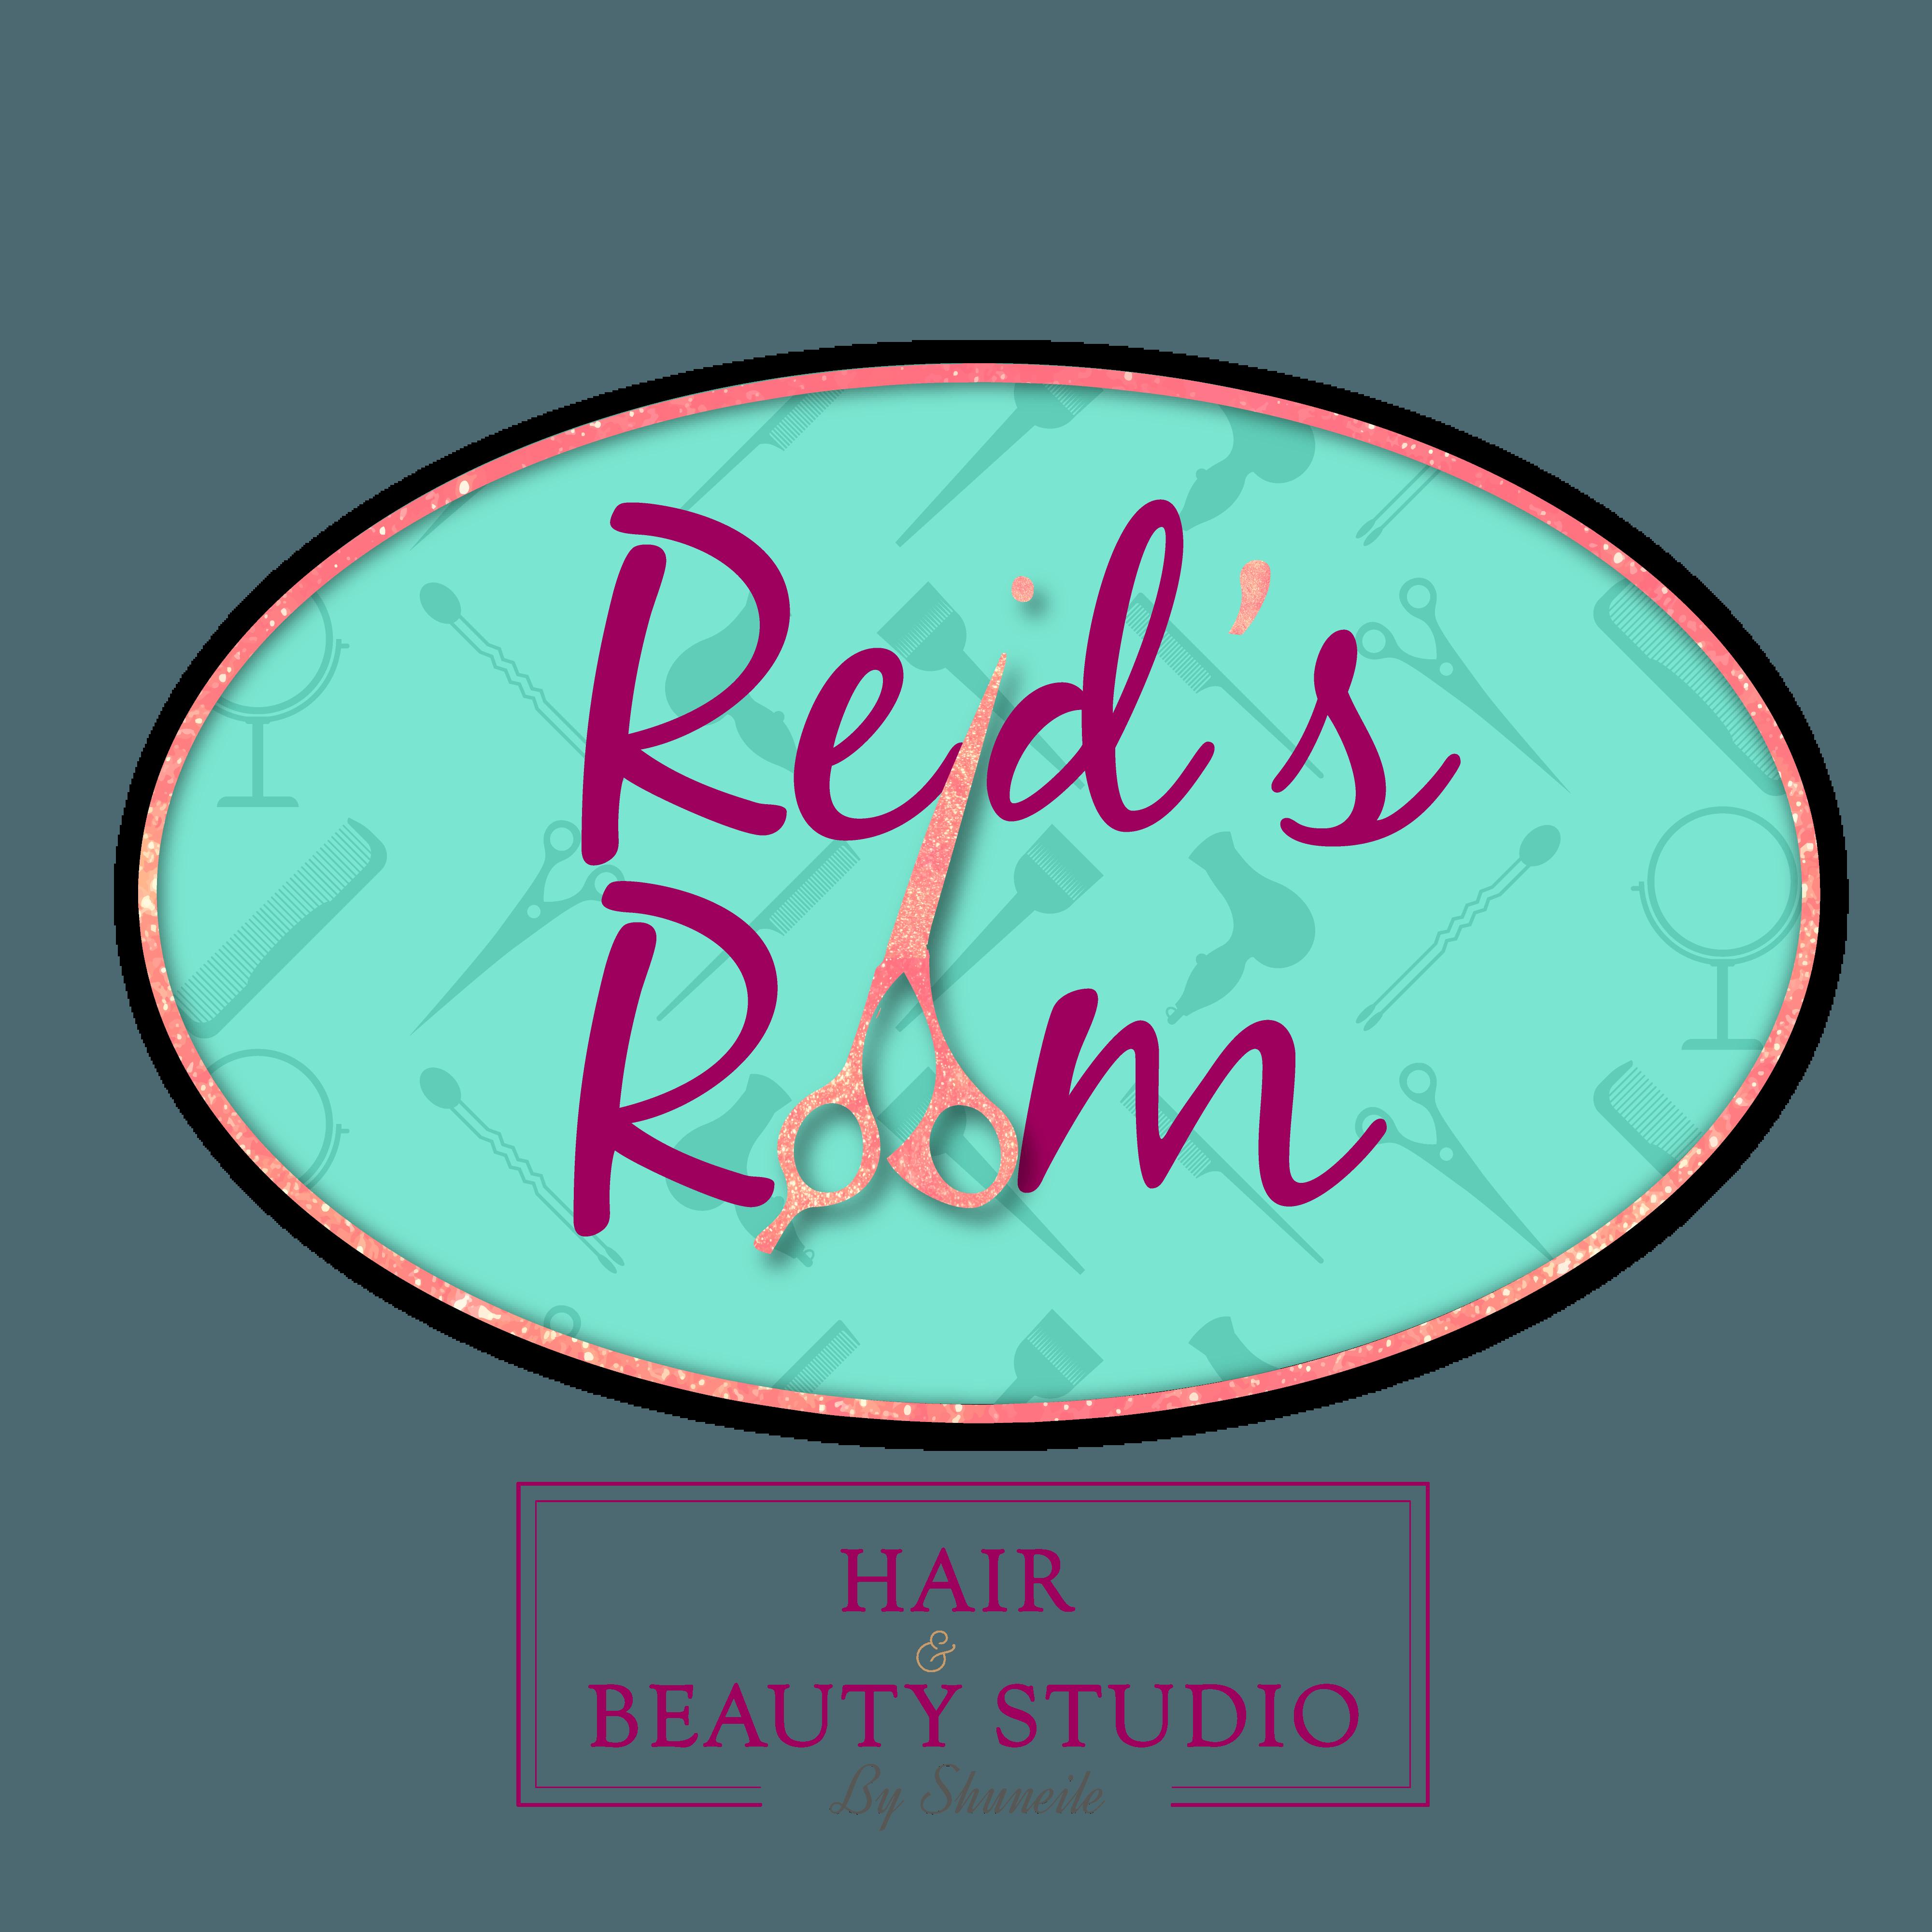 Reid's Room Logo Design